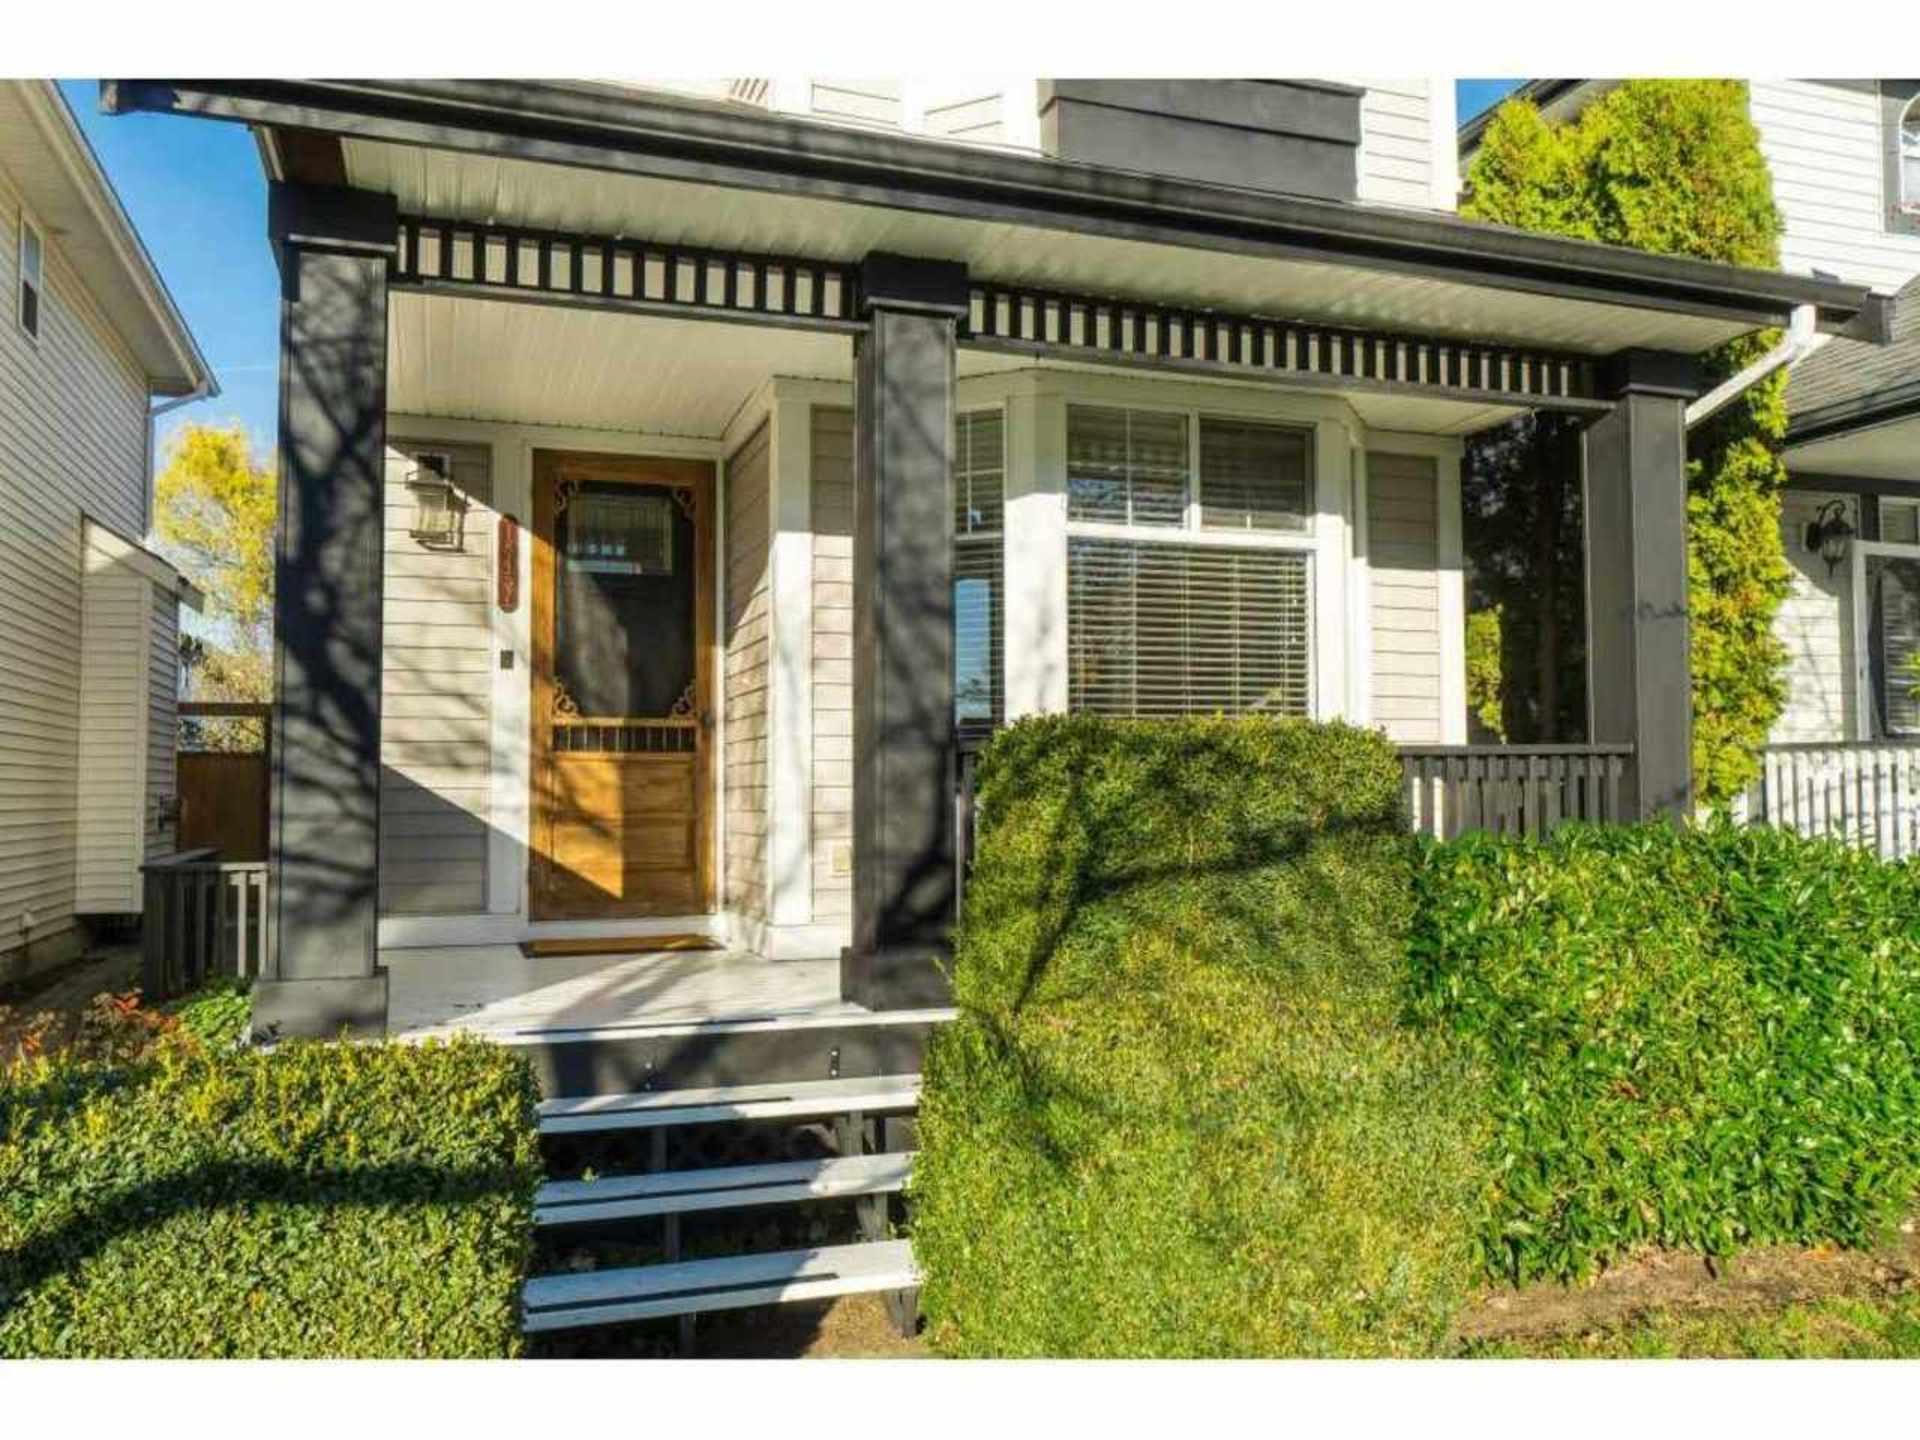 18457-65-avenue-cloverdale-bc-cloverdale-01 at 18457 65 Avenue, Cloverdale BC, Cloverdale